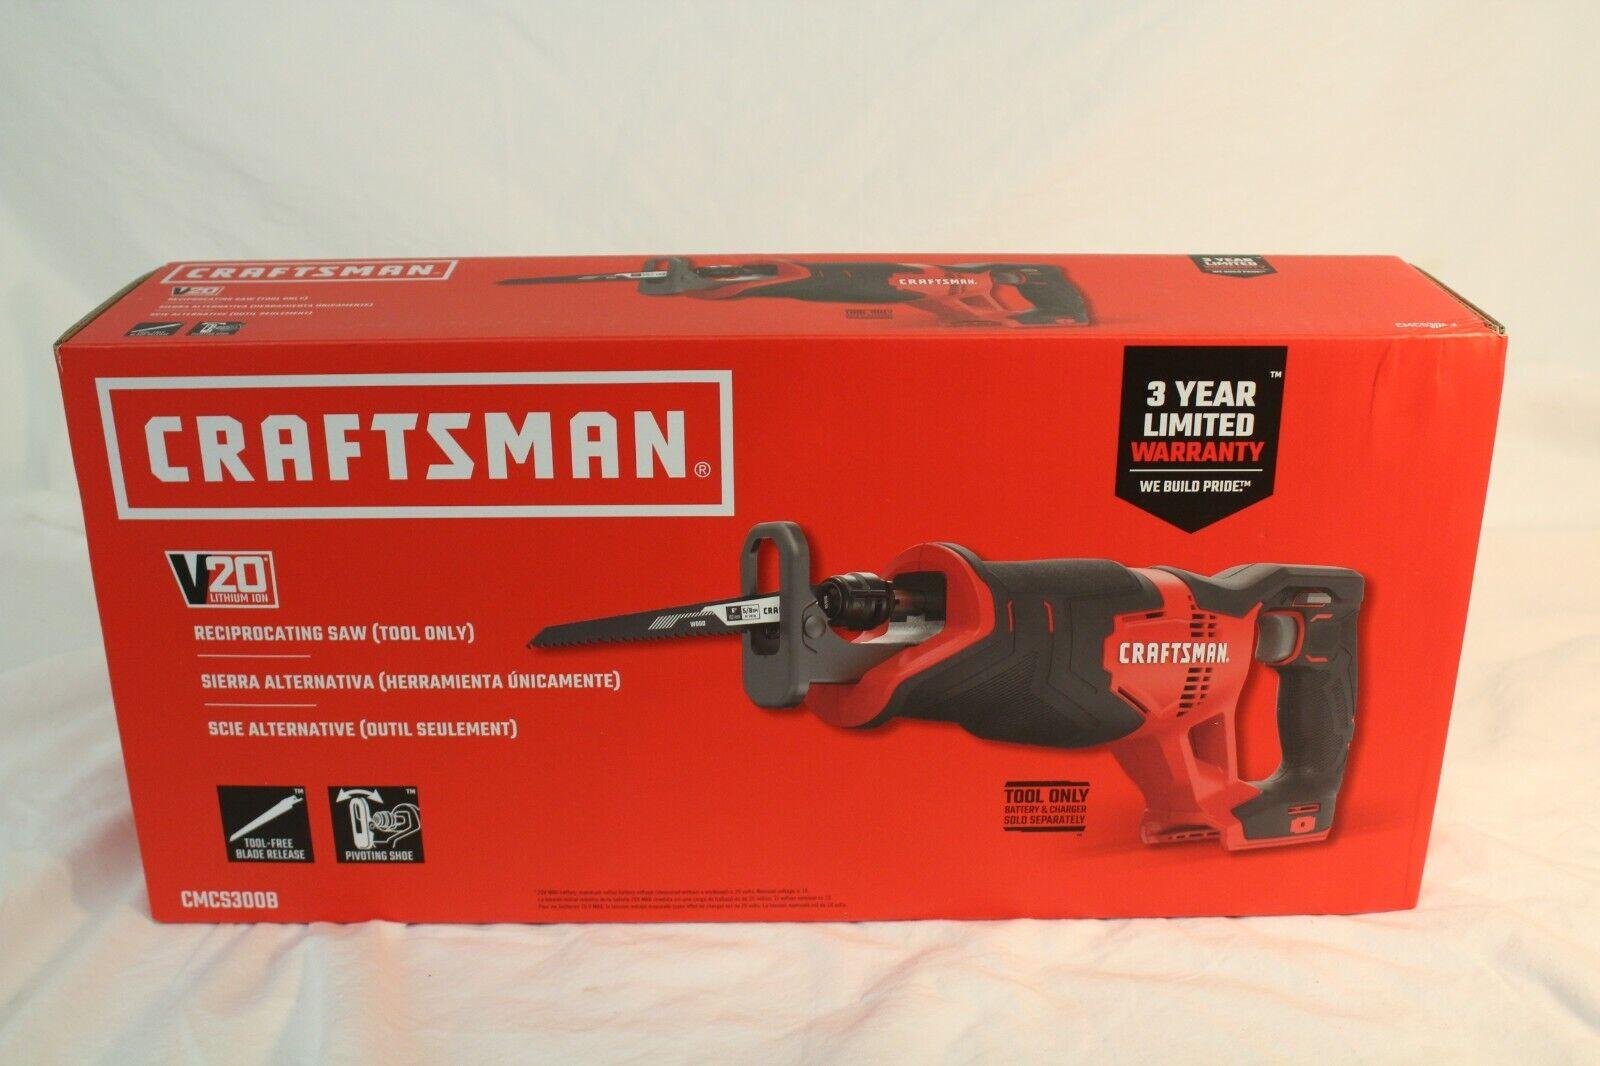 CRAFTSMAN CMCS300B V20 Cordless Reciprocating Saw